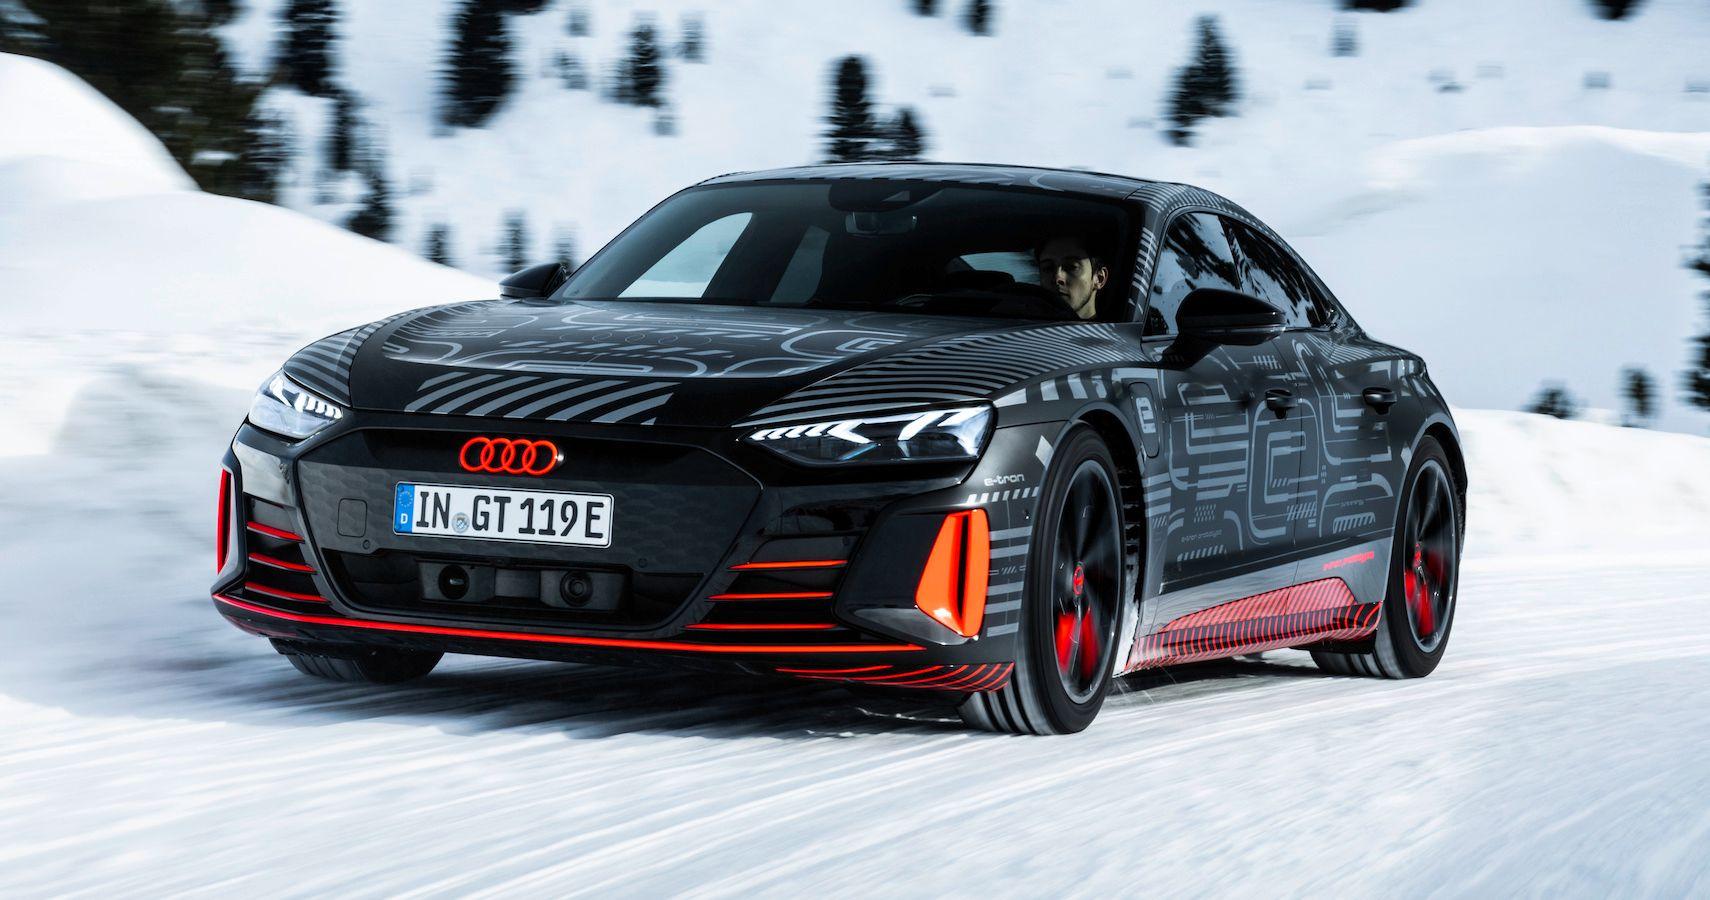 2021 Audi e-Tron GT Designer Teases Further Details Before February 9 World Premiere